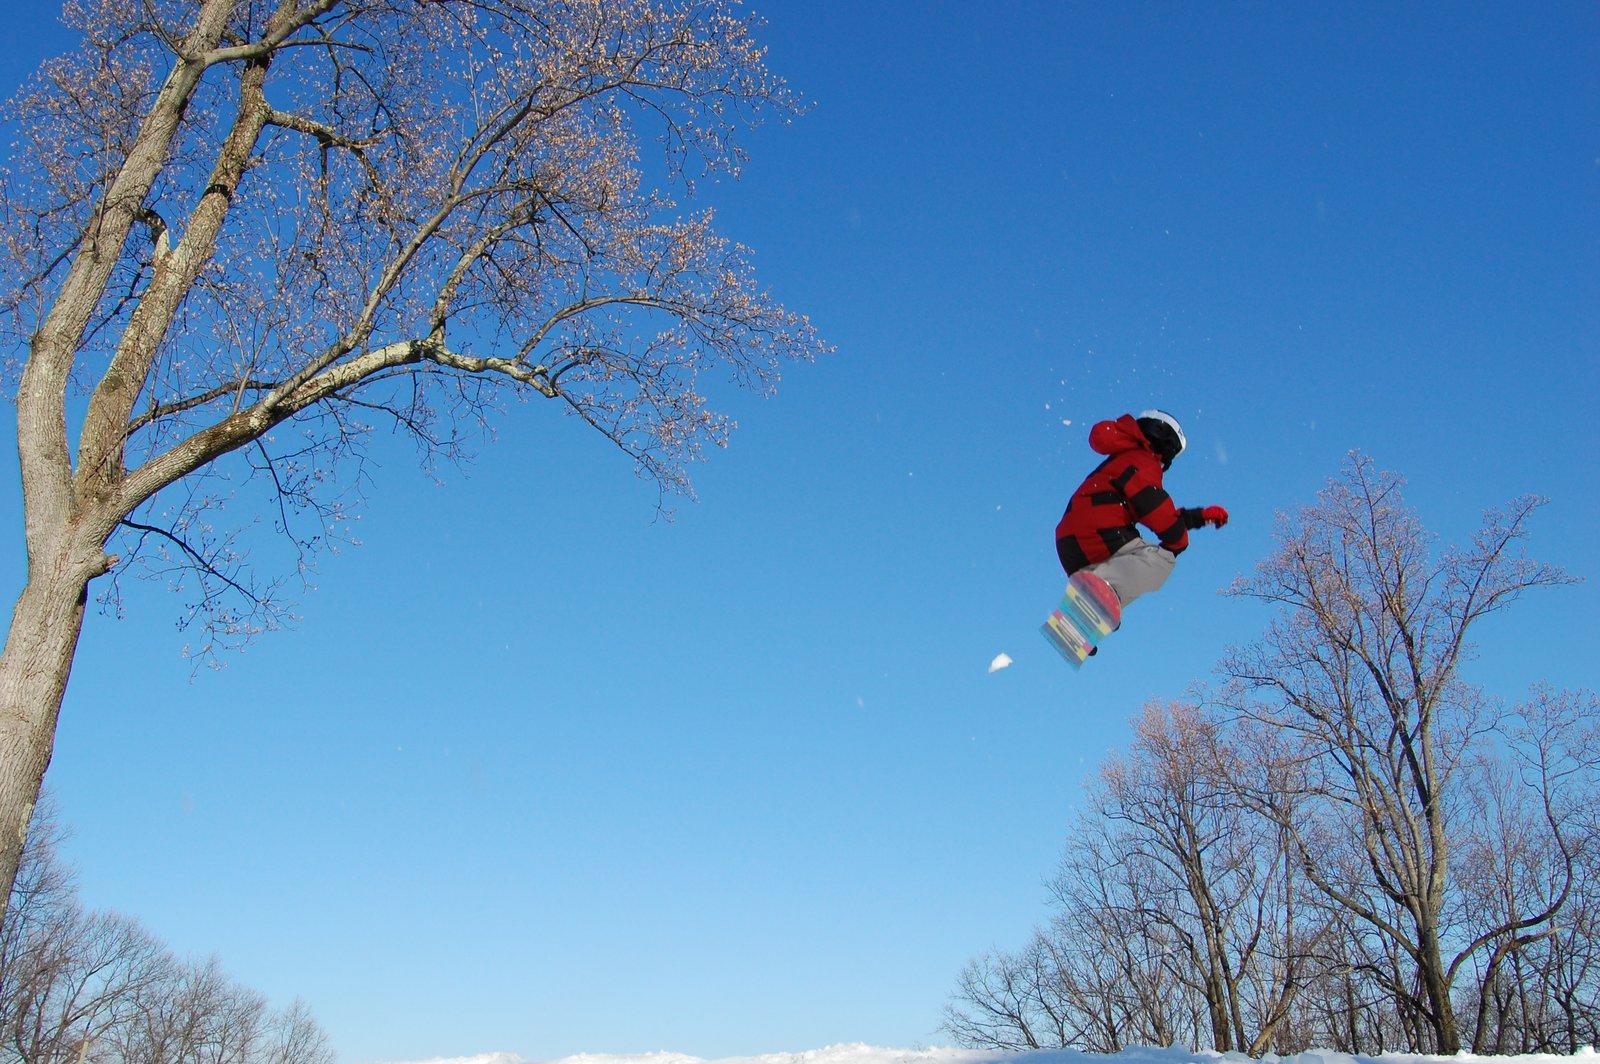 T-rev jump